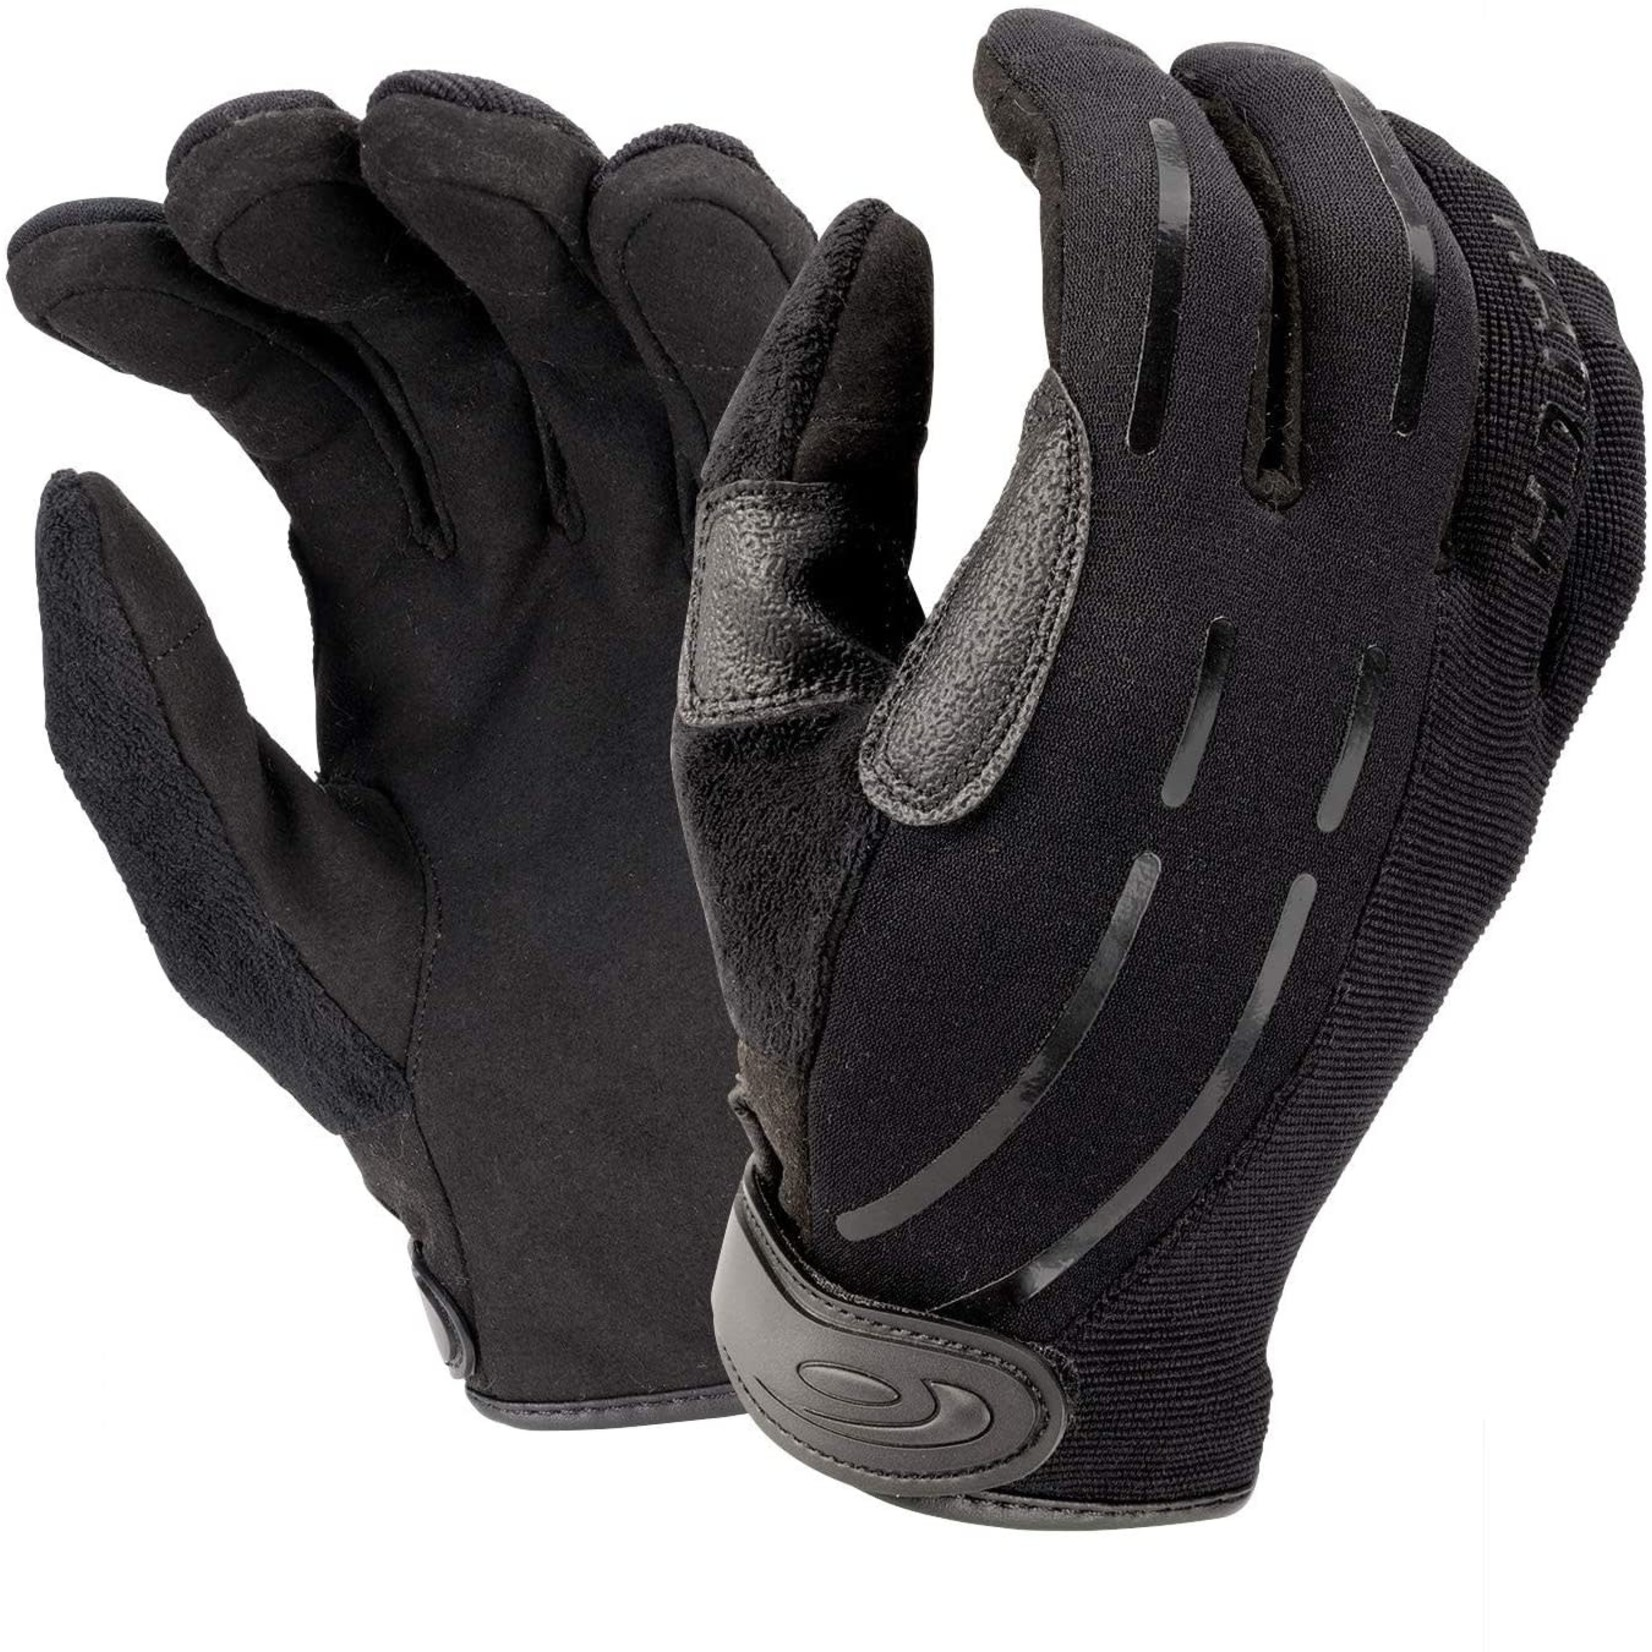 Hatch Hatch Armortip Puncture Resistant Gloves PPG2